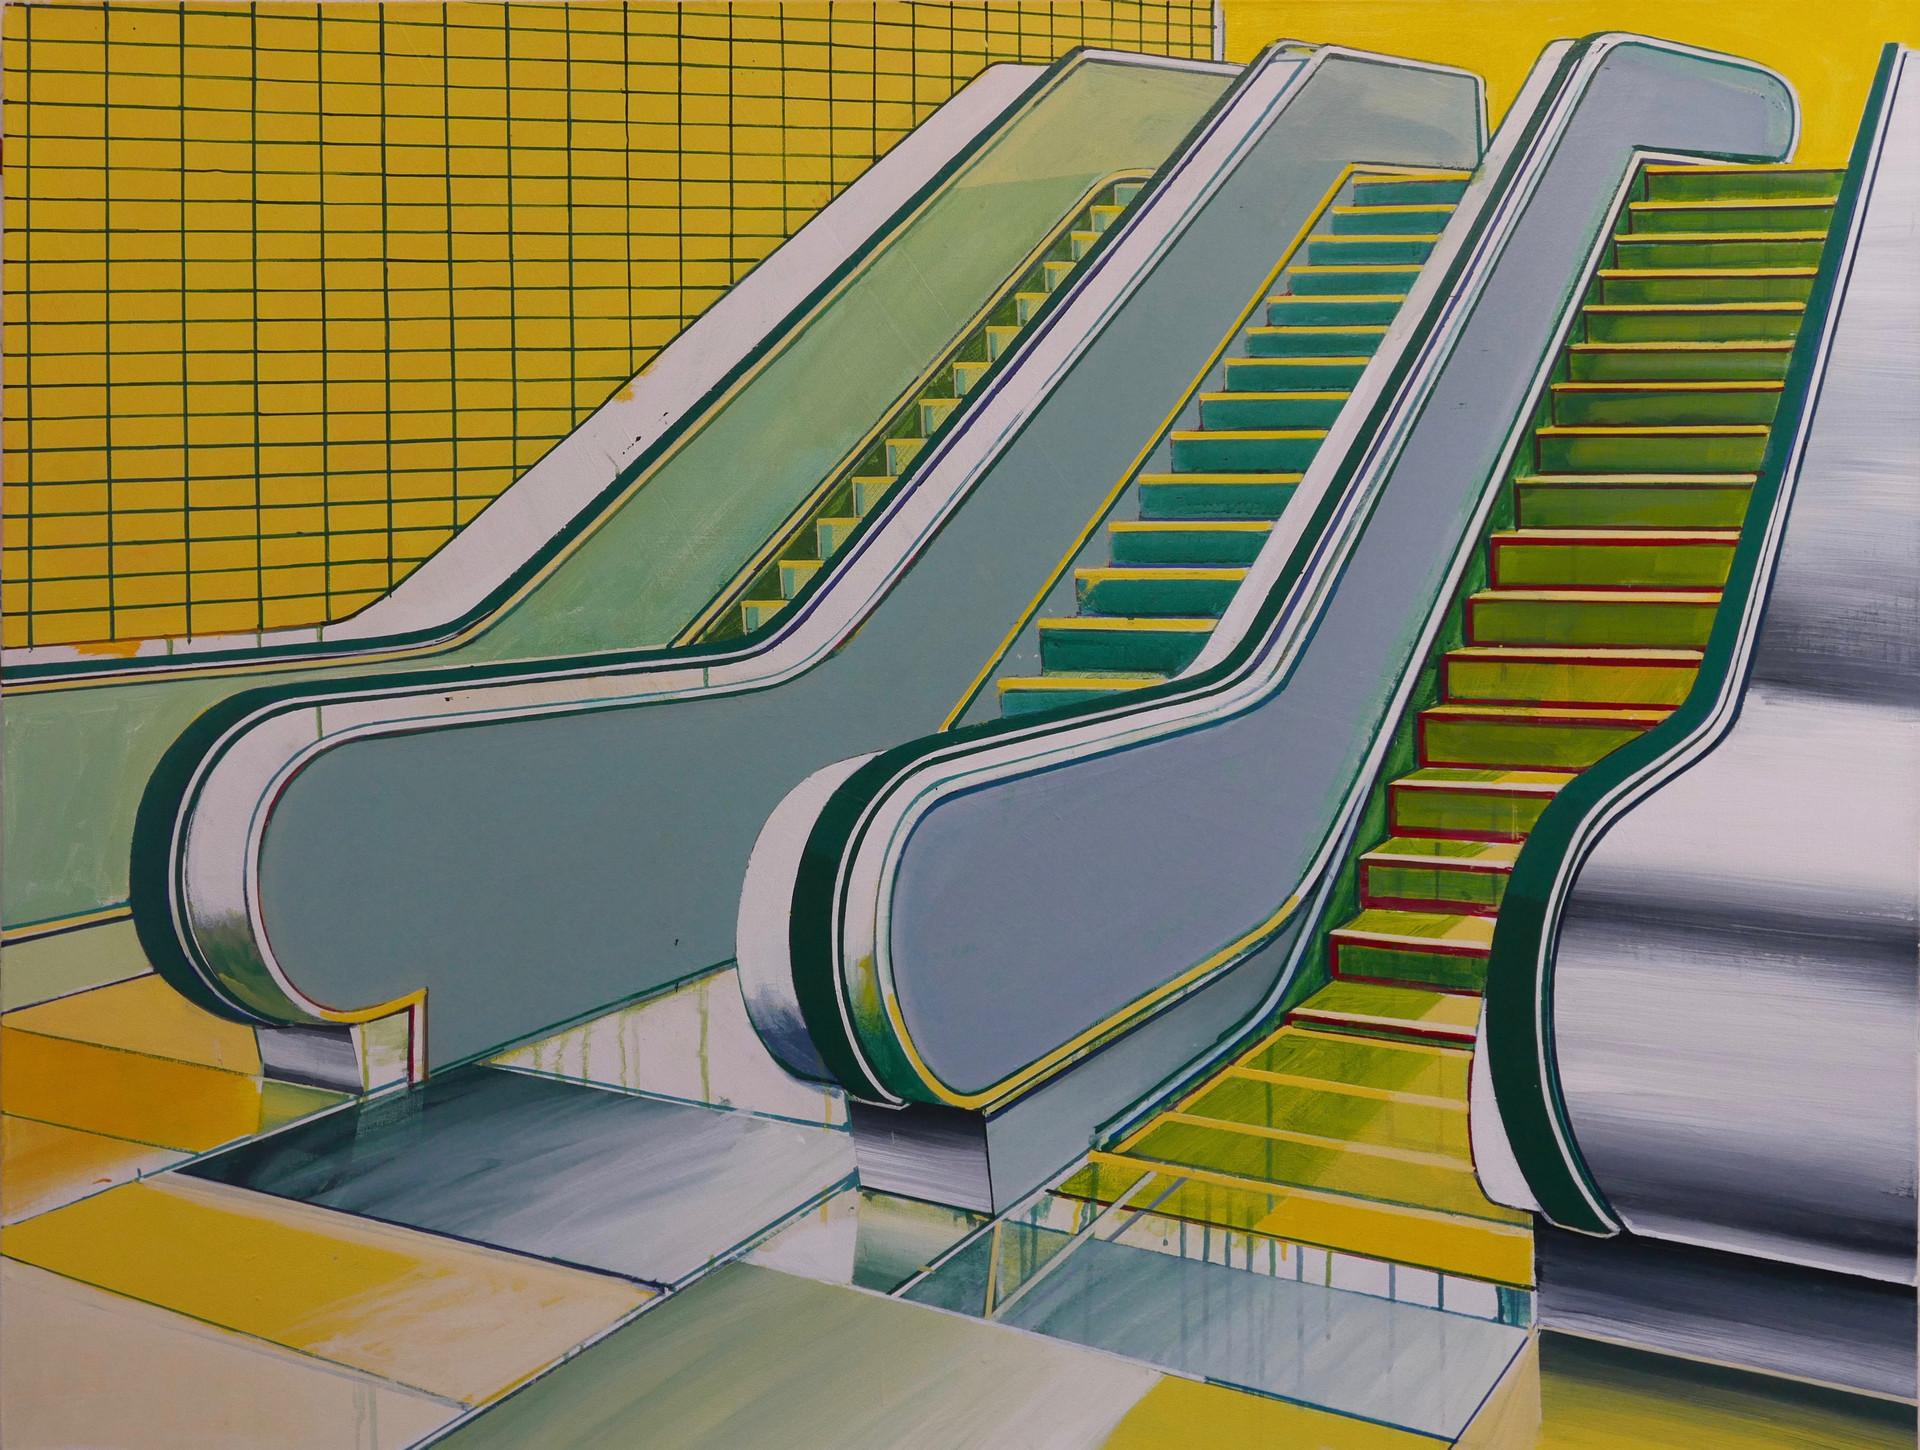 'Glasgow Subway' 125x100cm